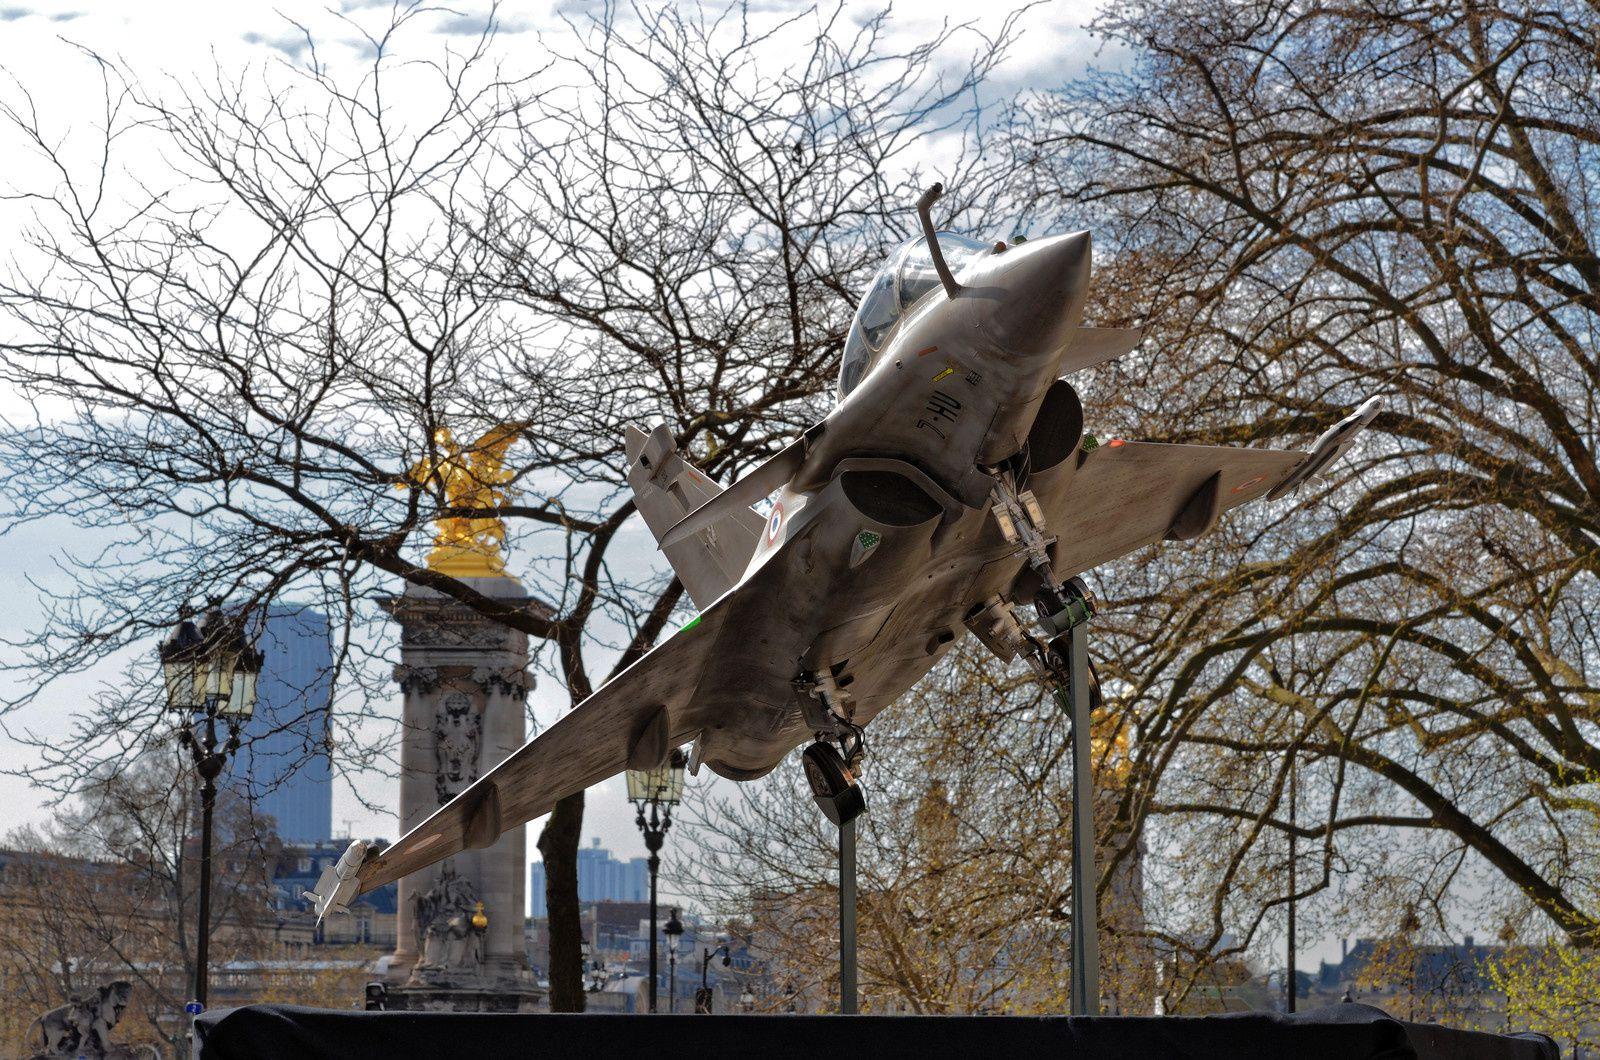 100 ans Dassault Aviation au Grand Palais